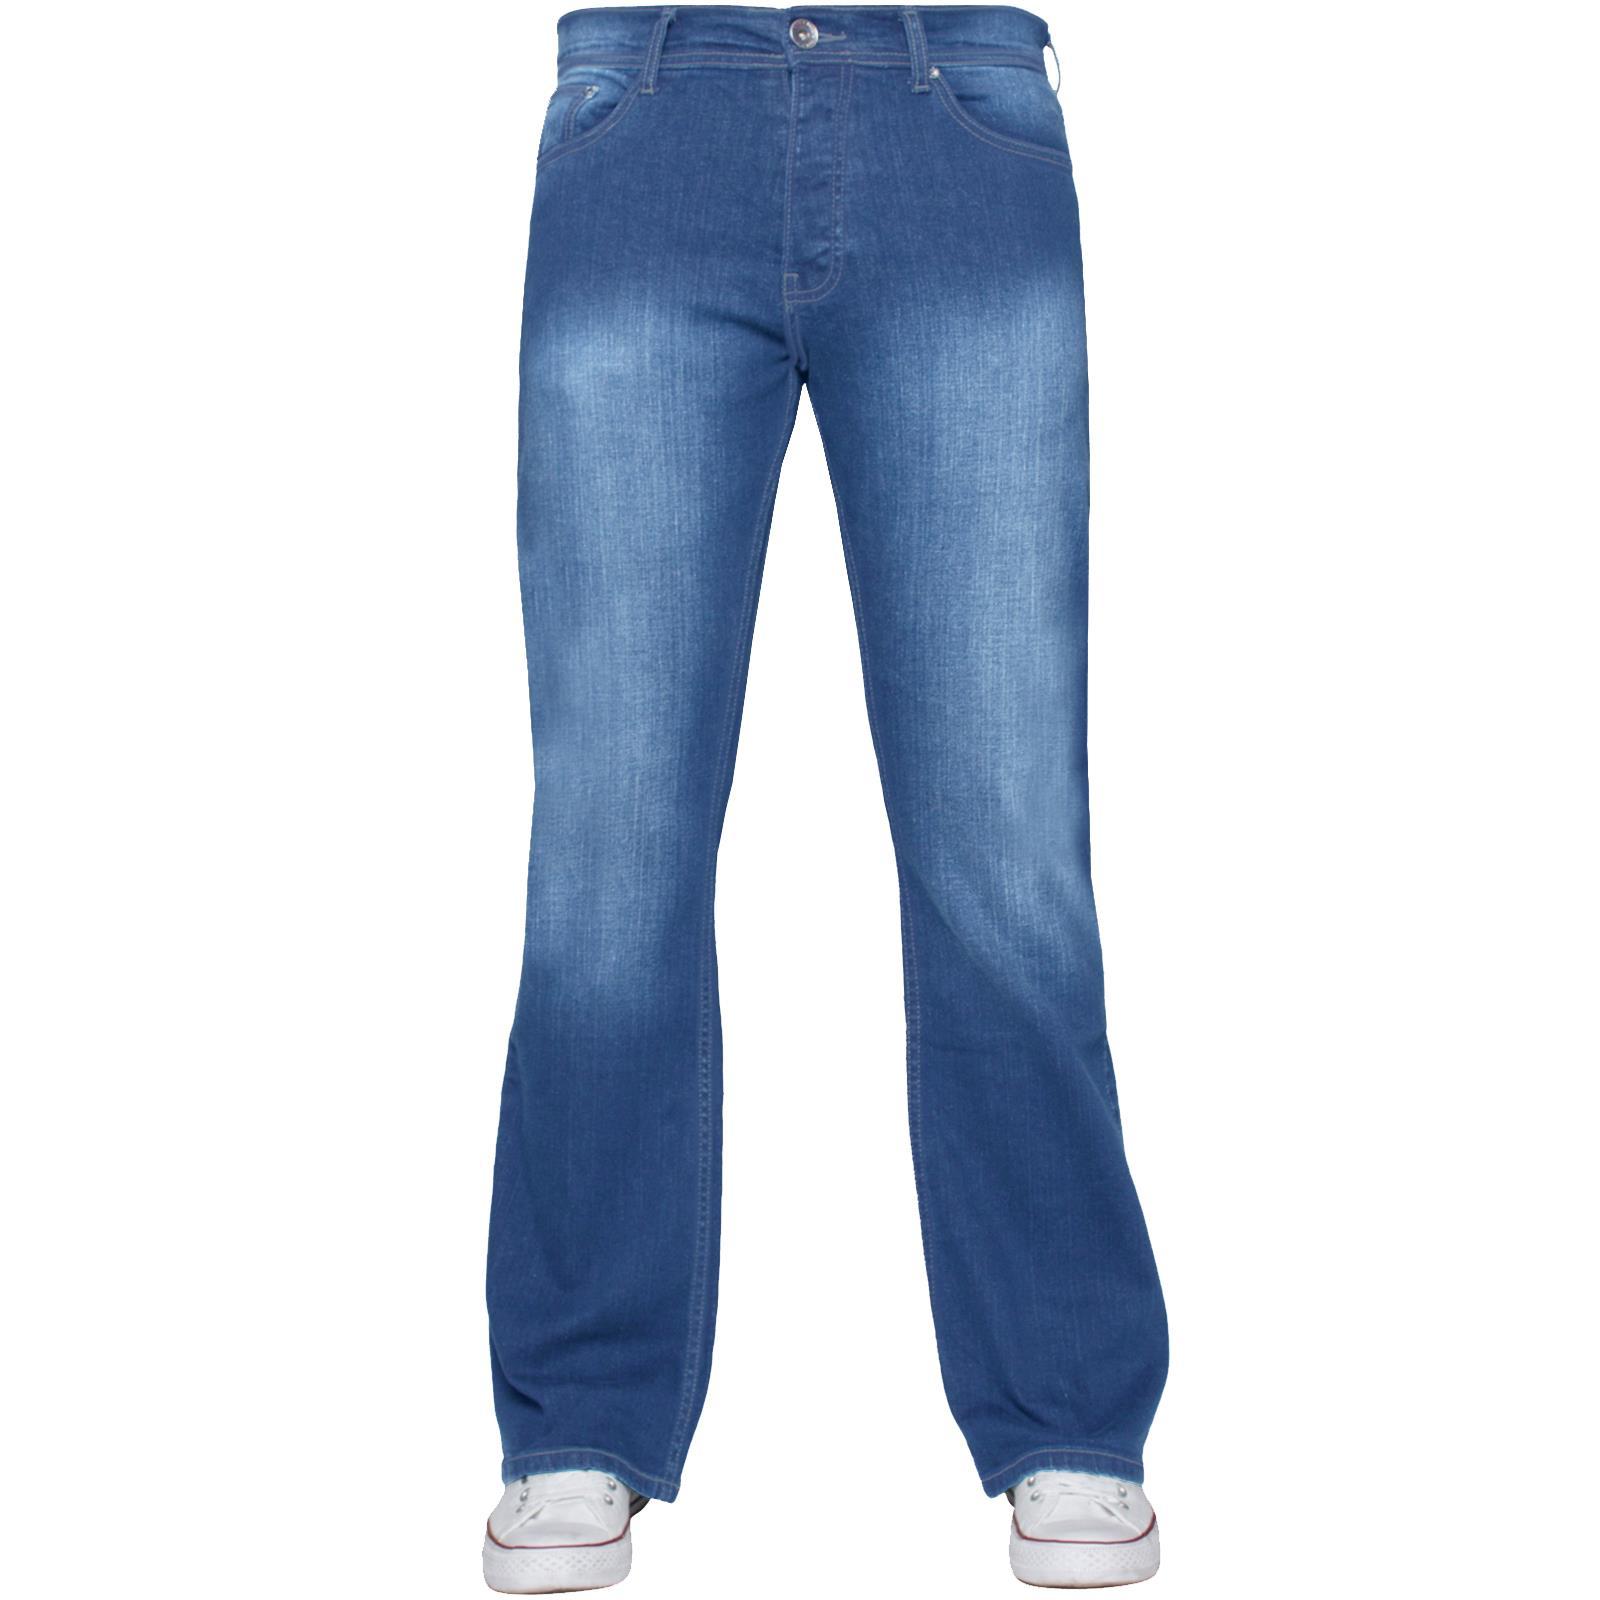 Para-Hombre-Pierna-Recta-Bootcut-Stretch-Denim-Regulares-Pantalon-de-trabajo-Kruze-Todas-Cinturas miniatura 76